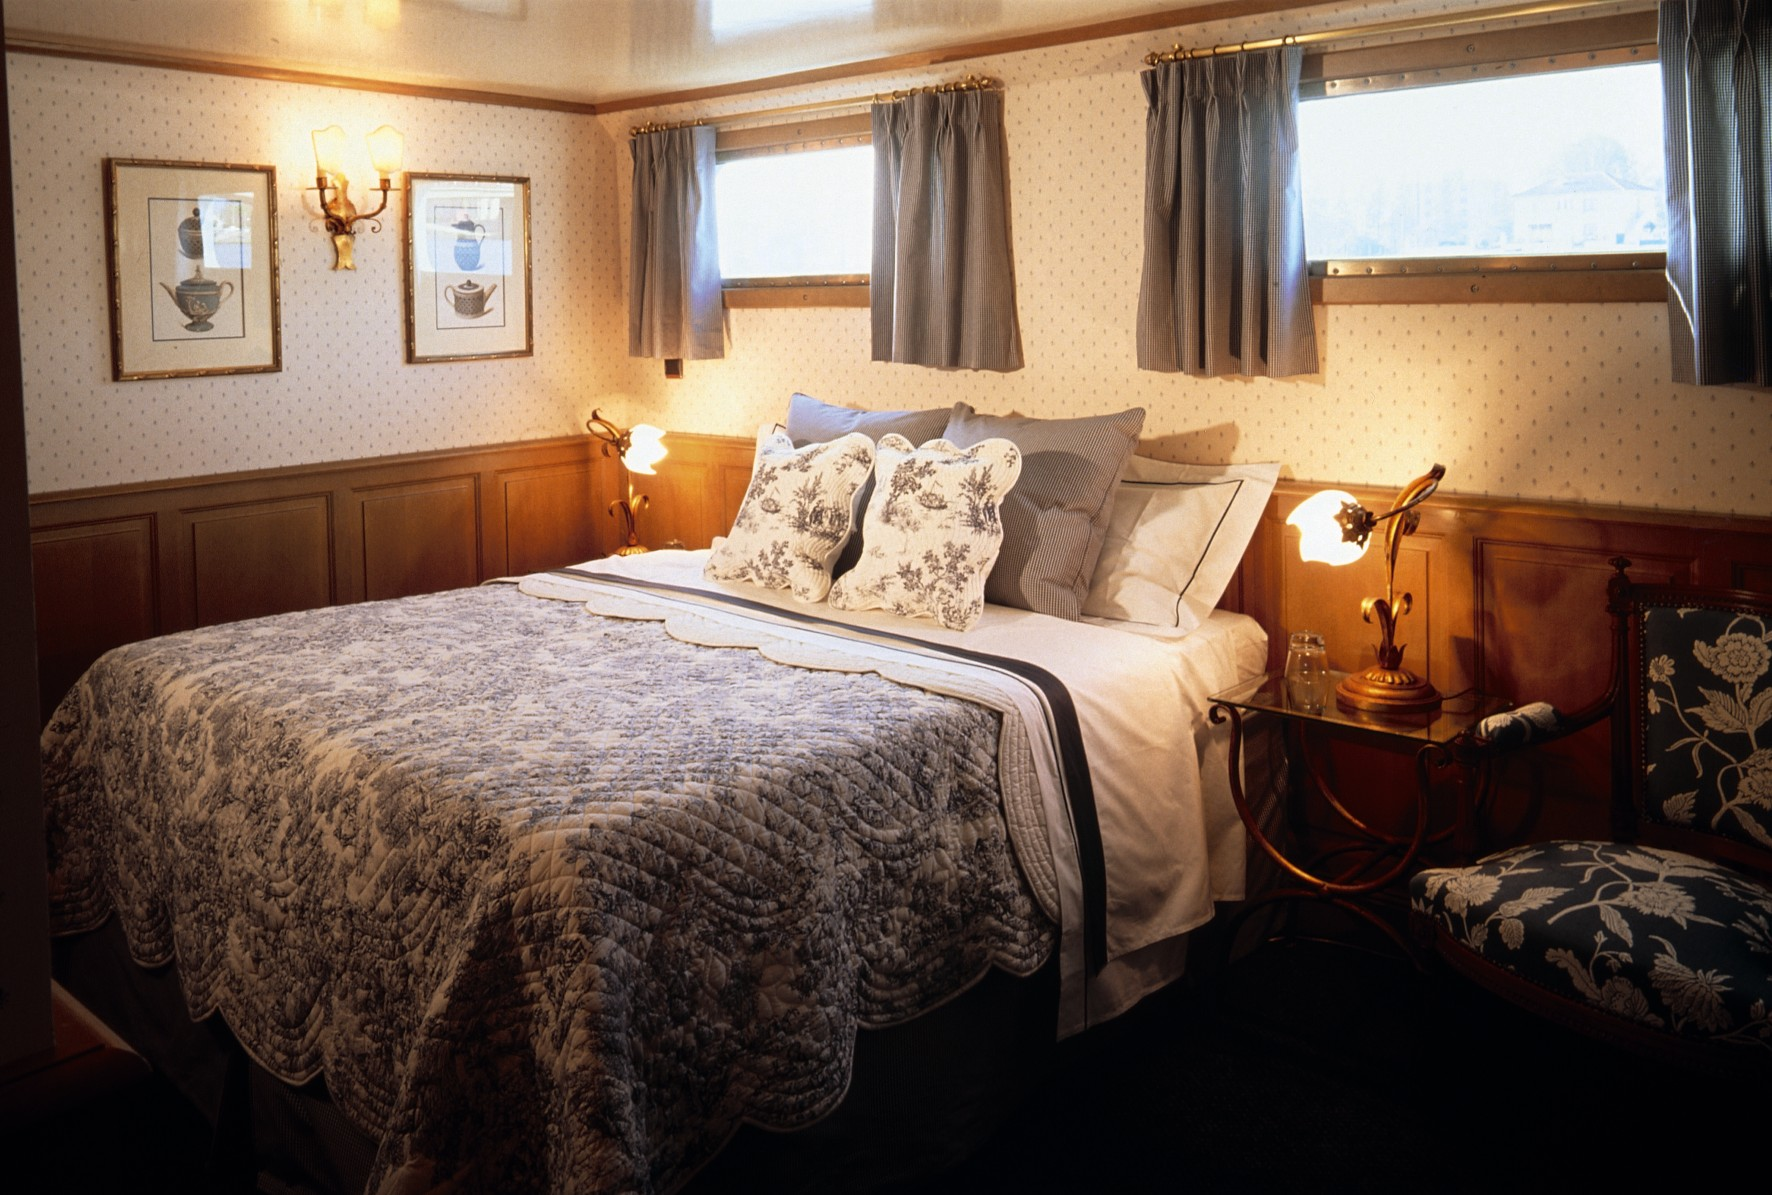 Belmond River Cruises Belmond Amaryllis Accommodation Bedroom 1.jpg